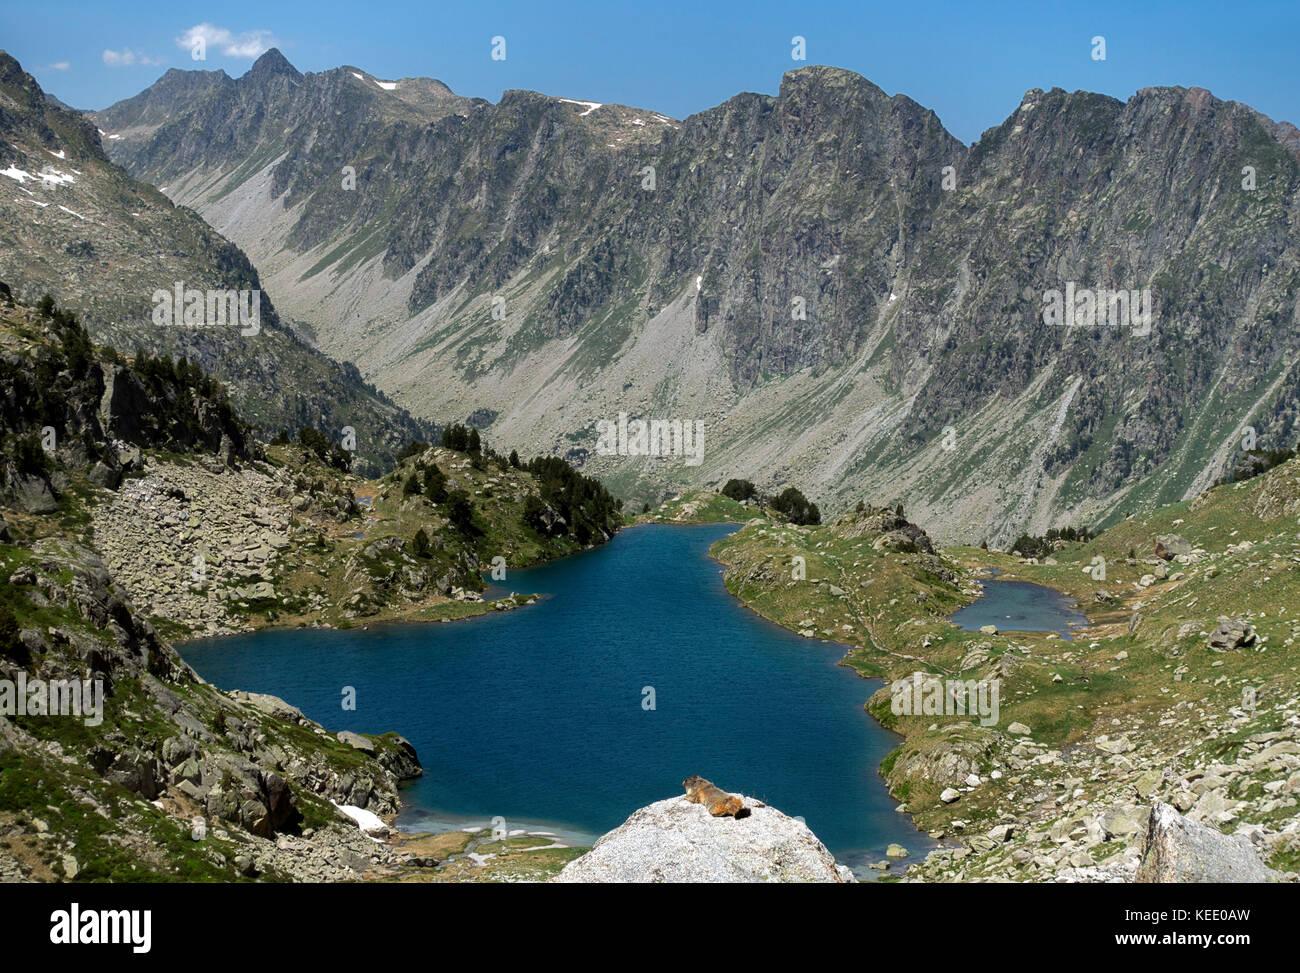 Marmot sunbathing.Aigüestortes National Park.Pyrenees.Catalunya.Spain - Stock Image